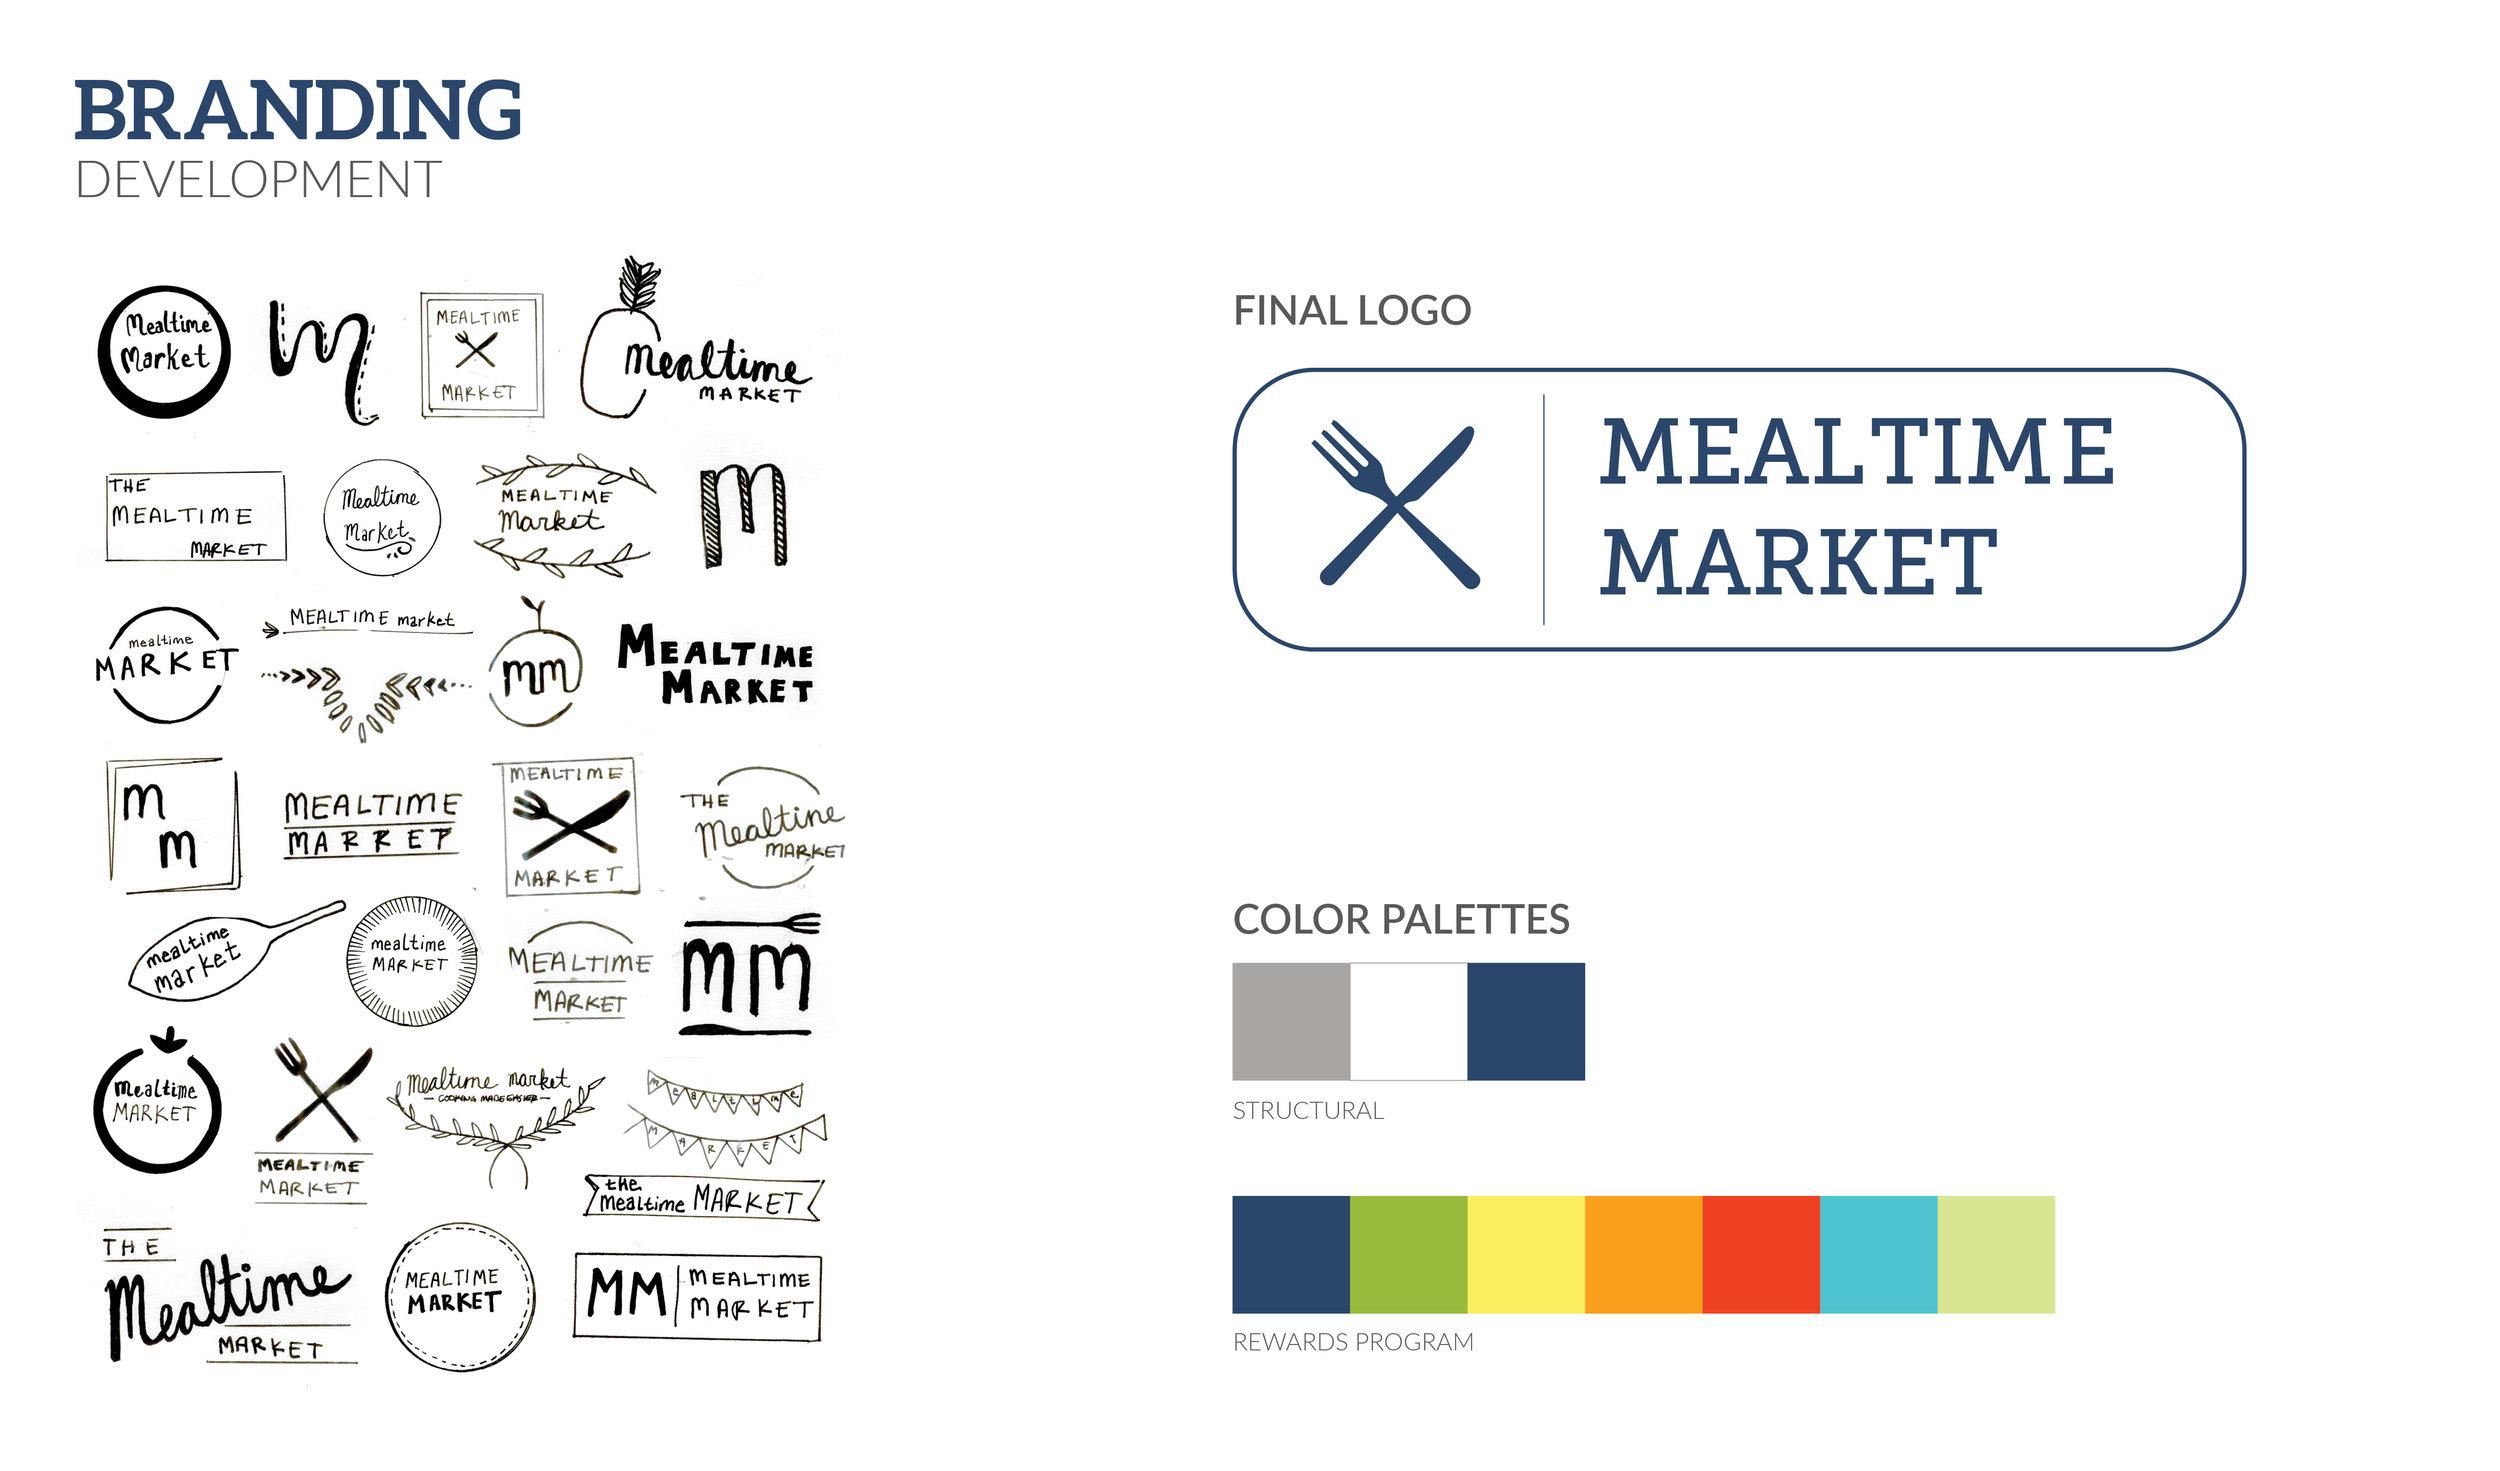 McInturf_Mealtime Market_Process Book12.jpg